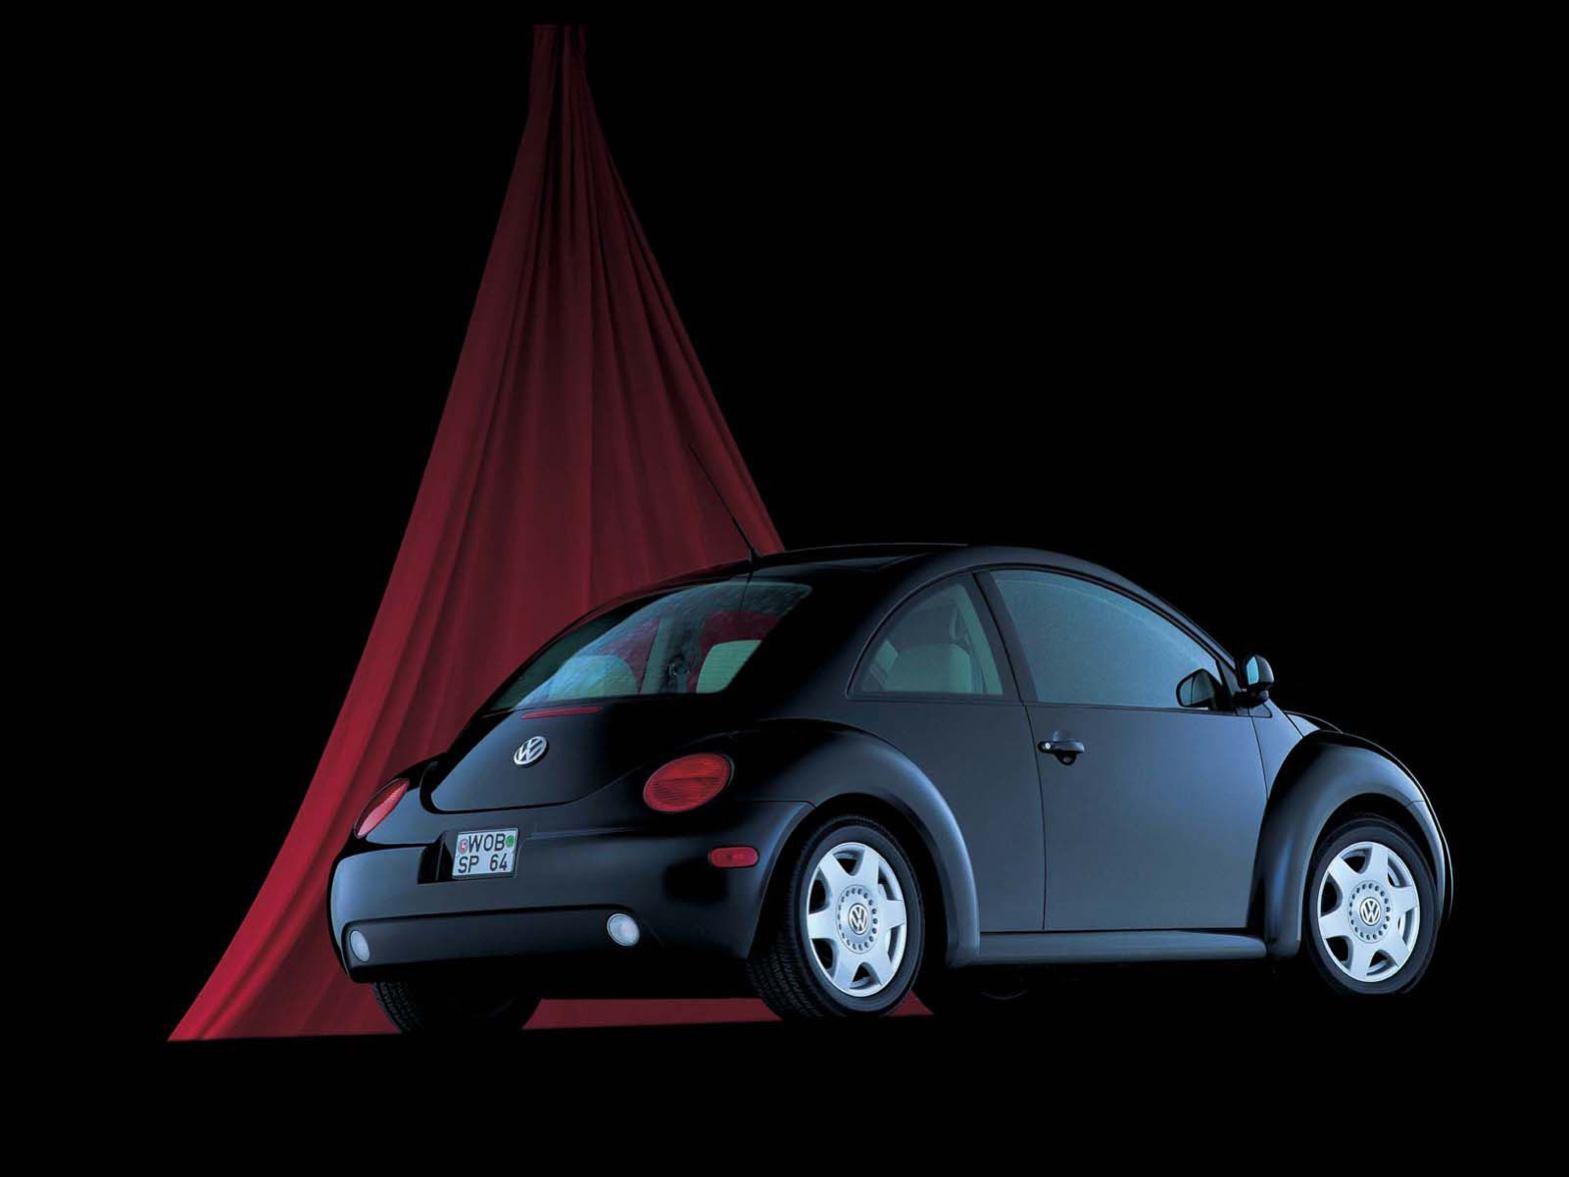 image volkswagen new beetle voiture pour lui. Black Bedroom Furniture Sets. Home Design Ideas